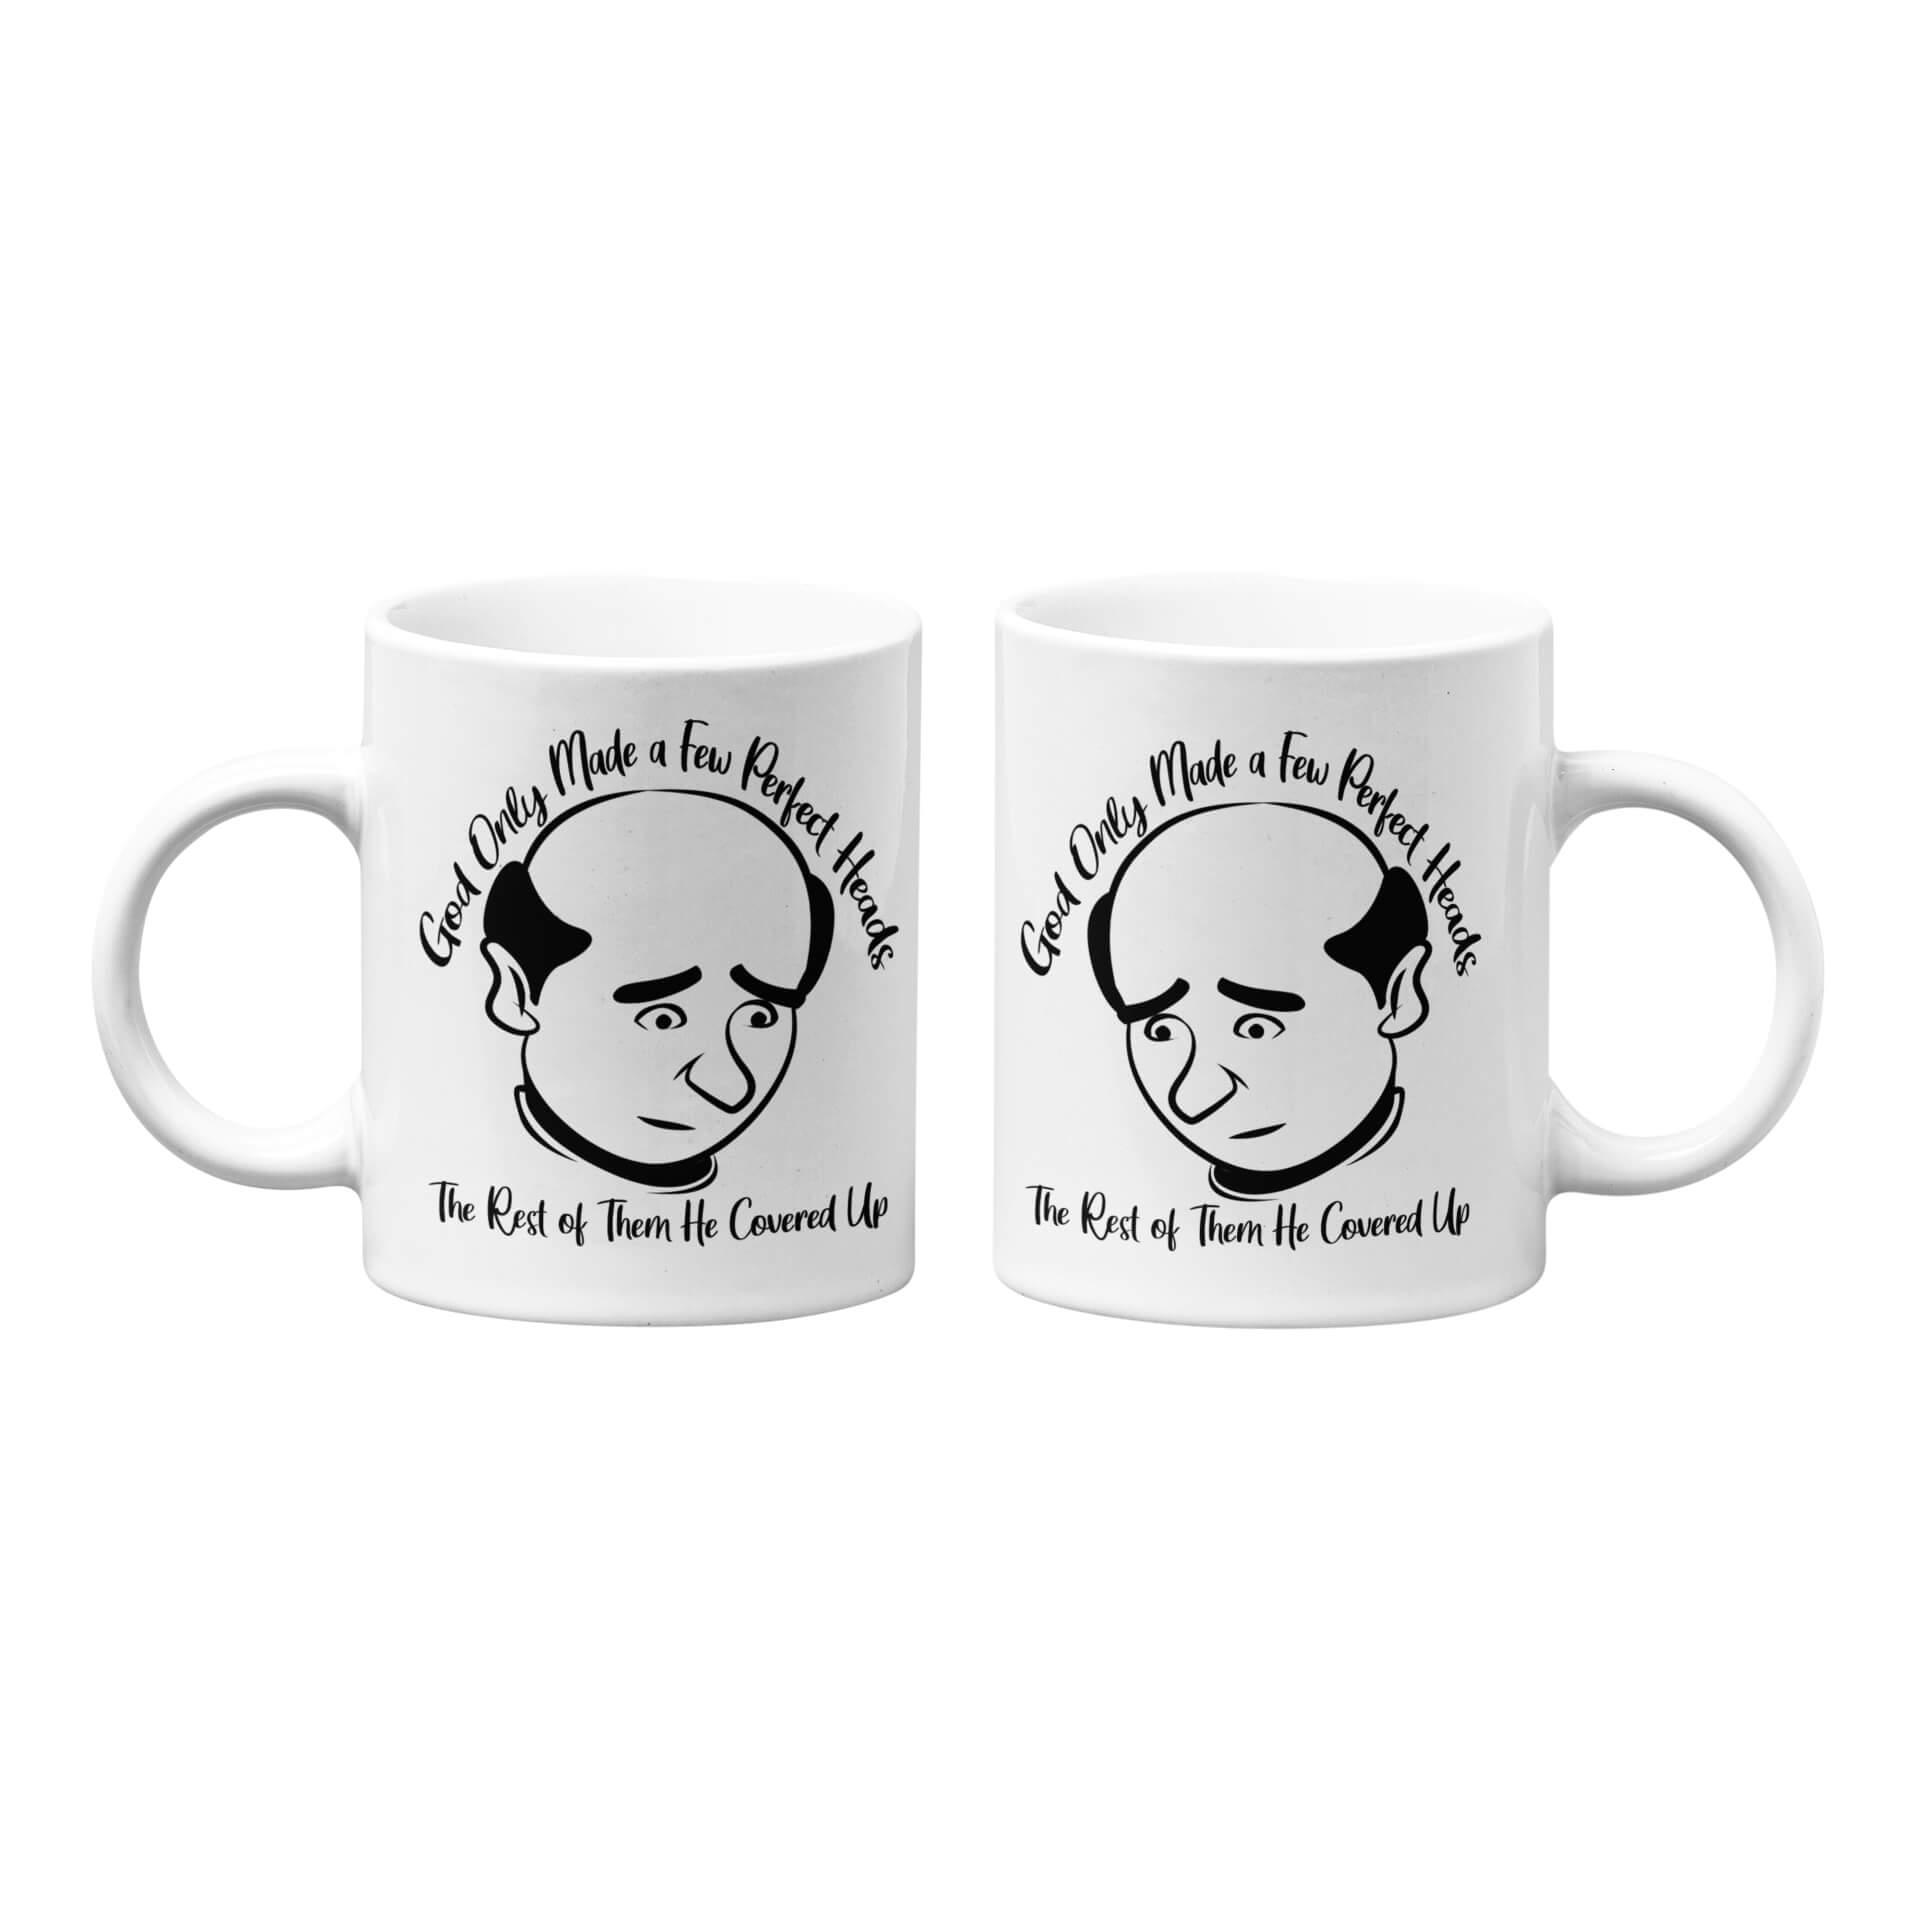 God Only Made a Few Perfect Heads Mug